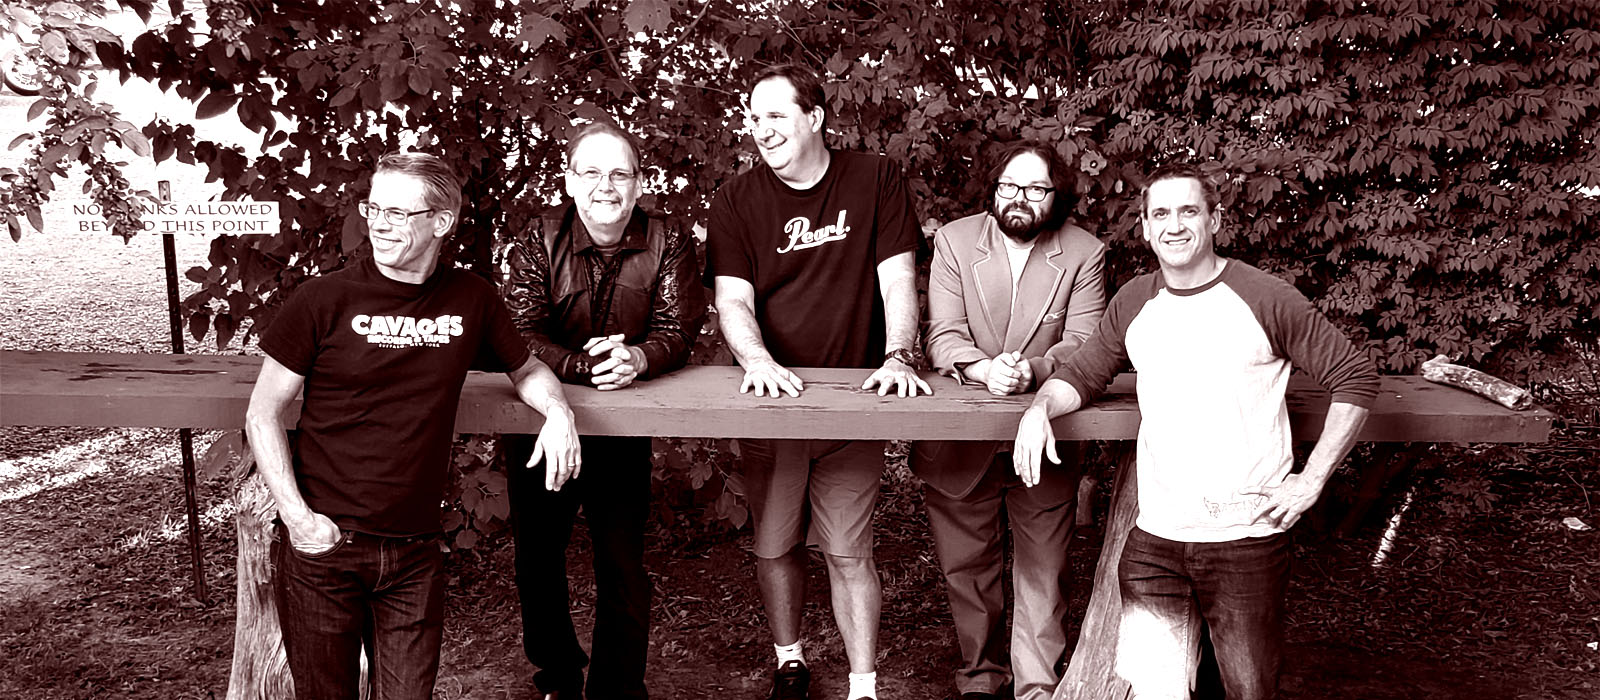 Box of Wine Band